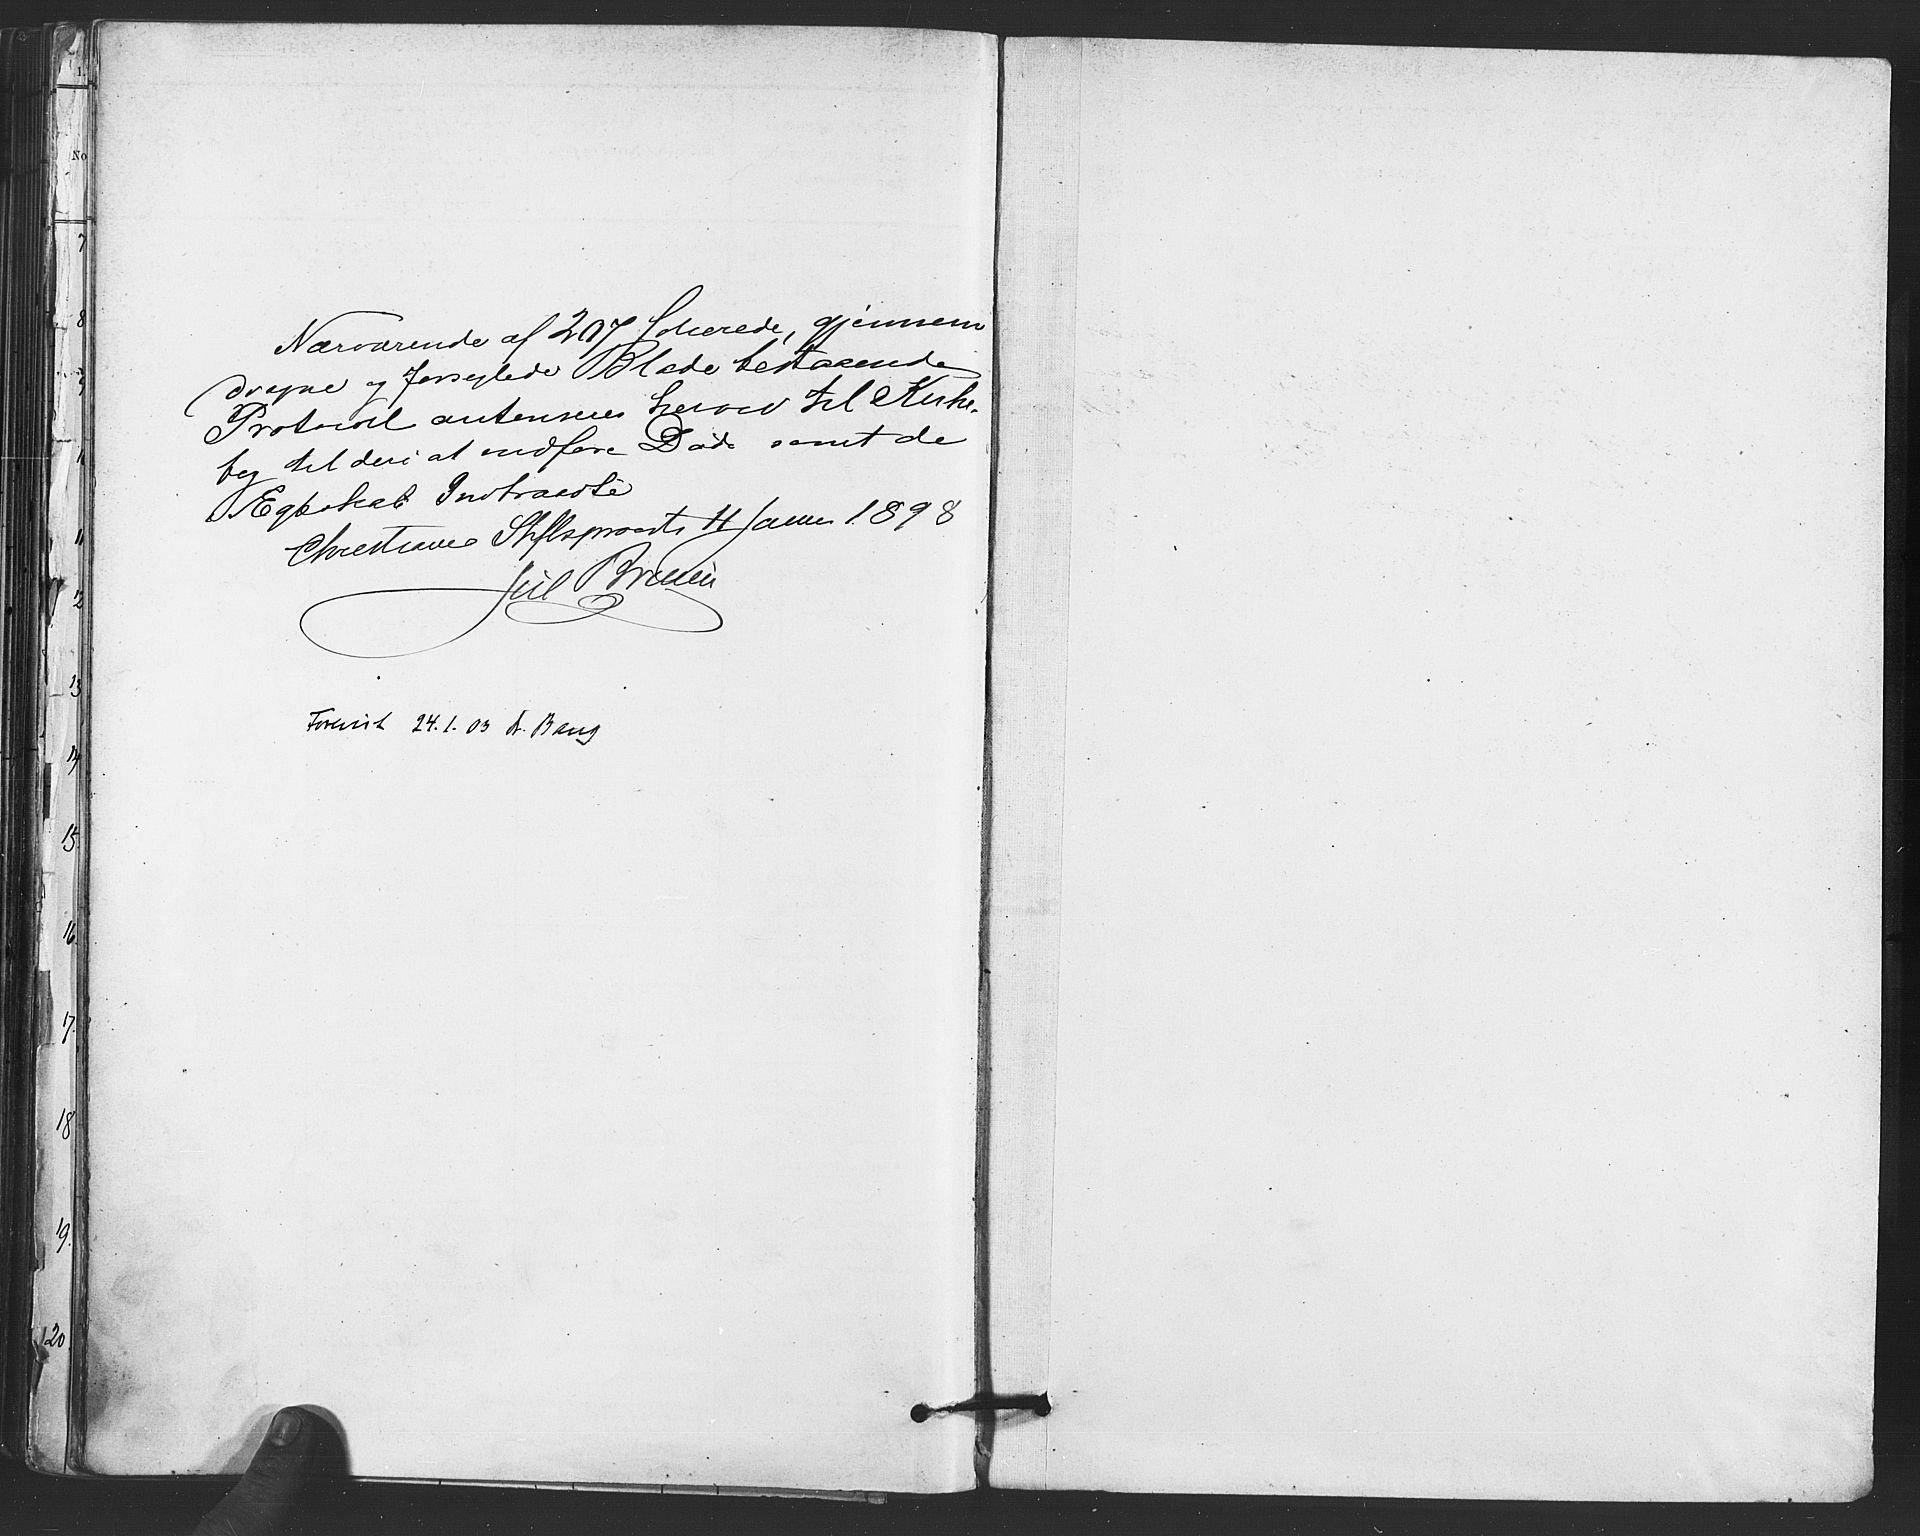 SAO, Paulus prestekontor Kirkebøker, F/Fa/L0012: Ministerialbok nr. 12, 1897-1908